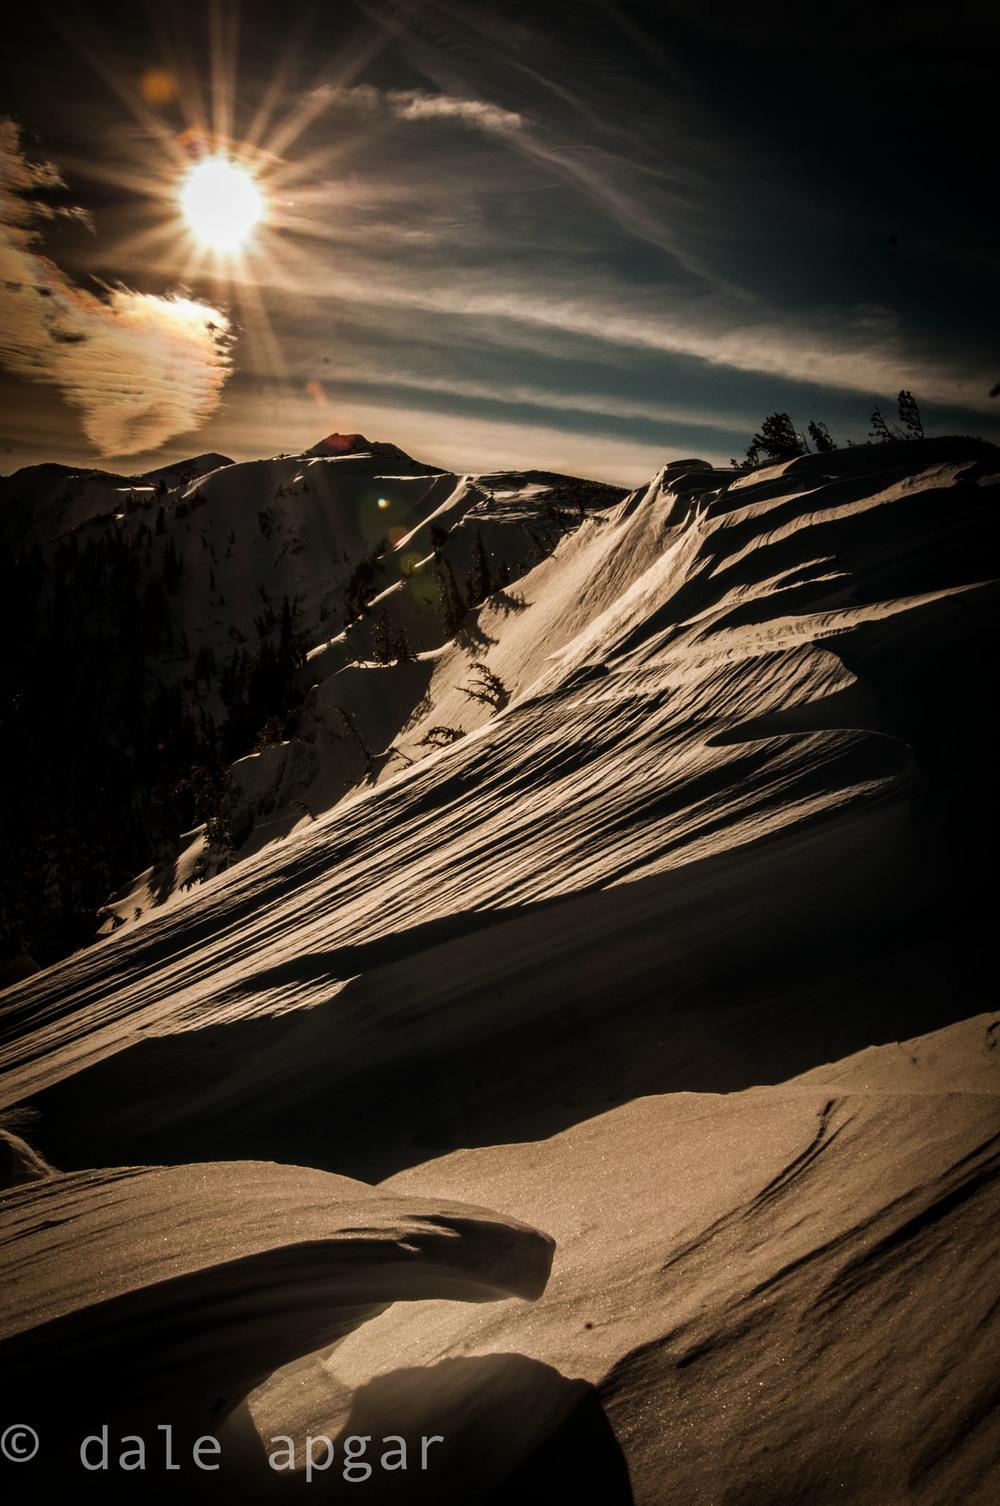 dale_apgar_ski-43.jpg